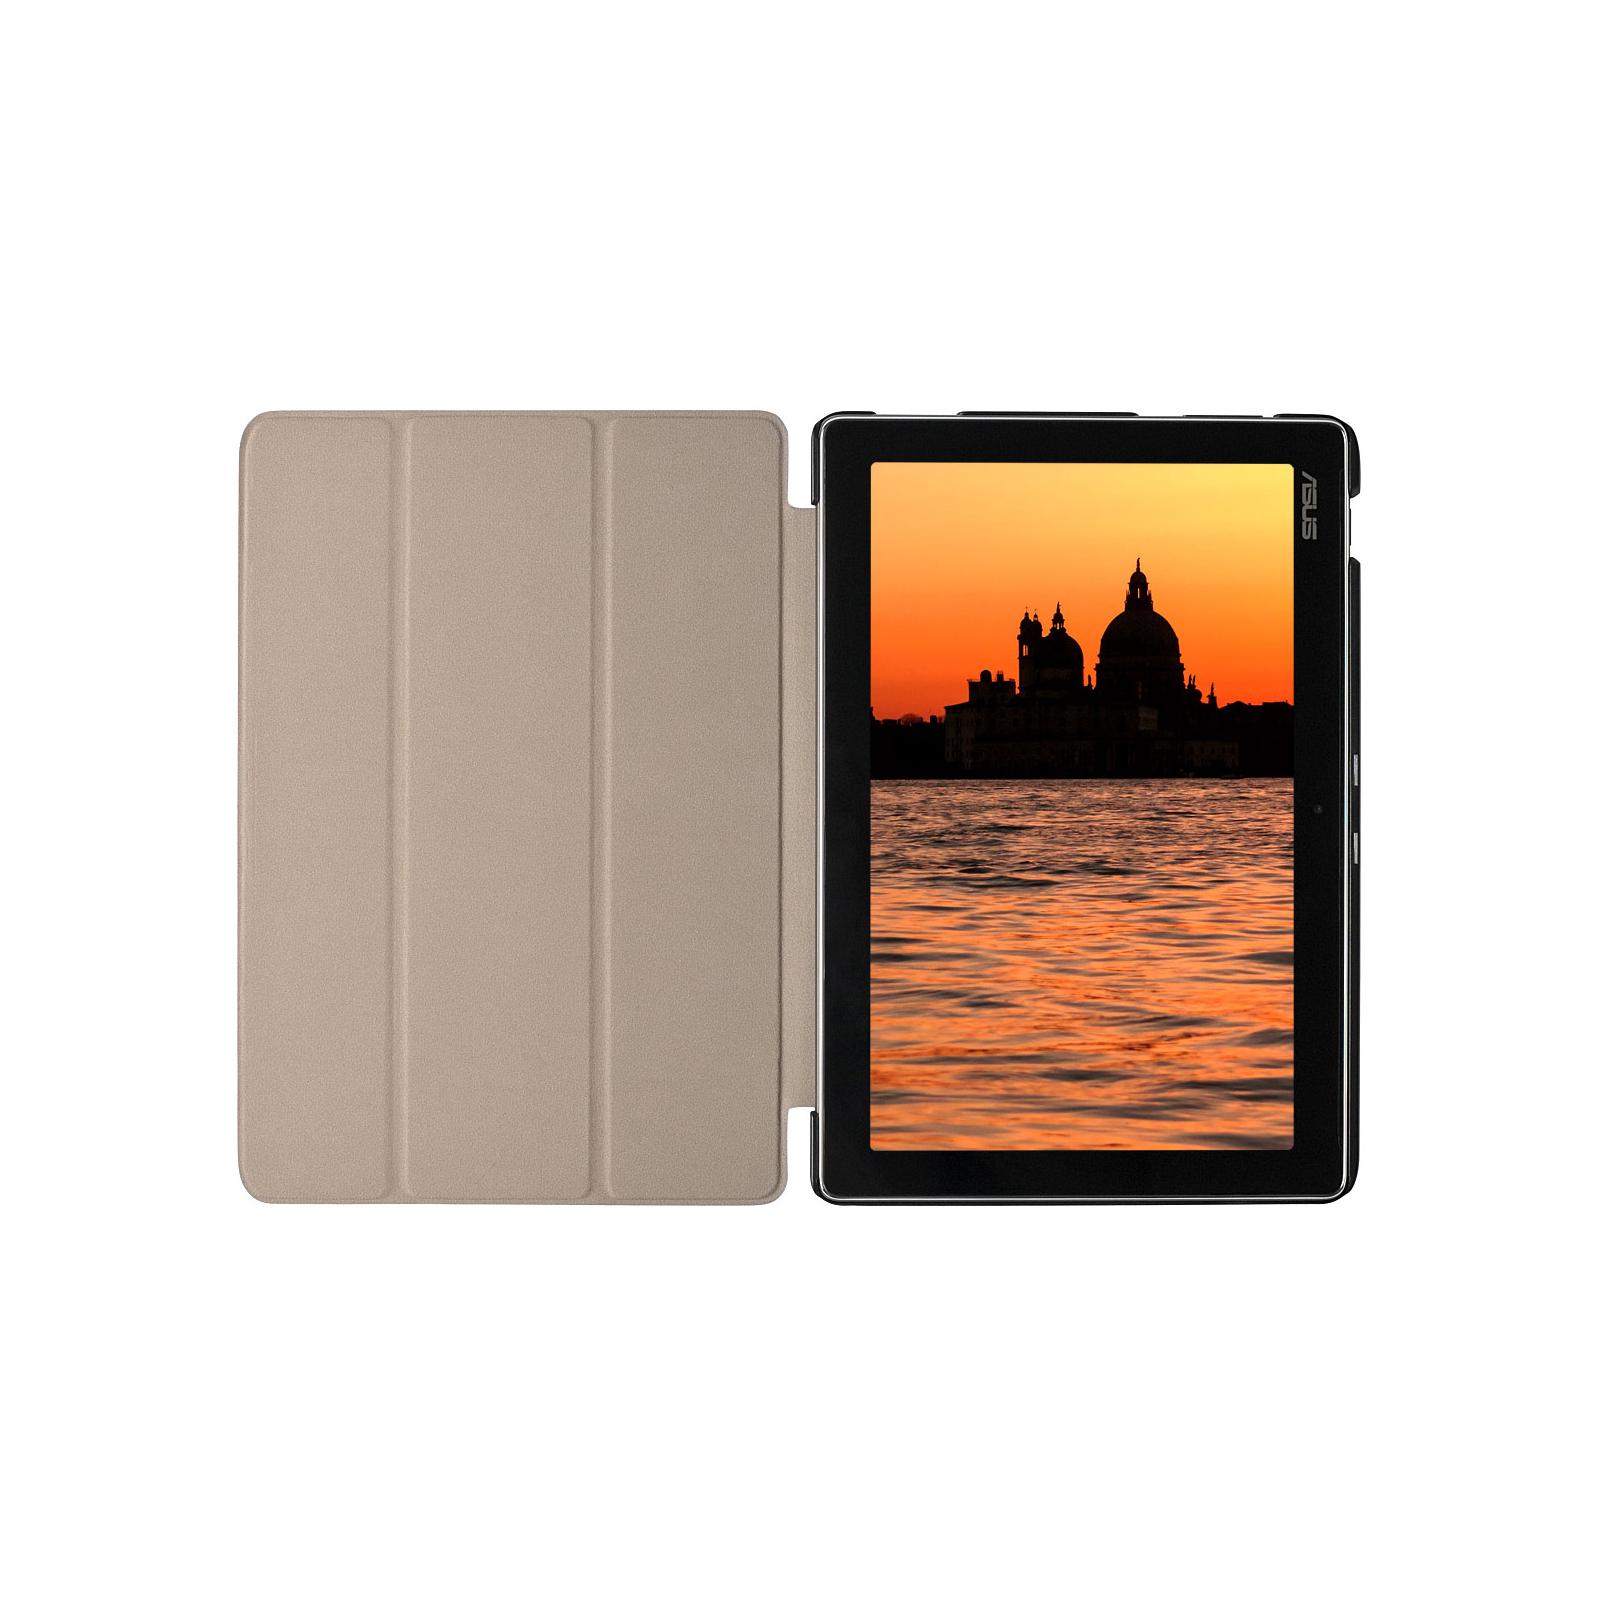 Чехол для планшета Grand-X ASUS ZenPad 10 Z300/Z300C Brown (ATC - AZPZ300BR) изображение 4